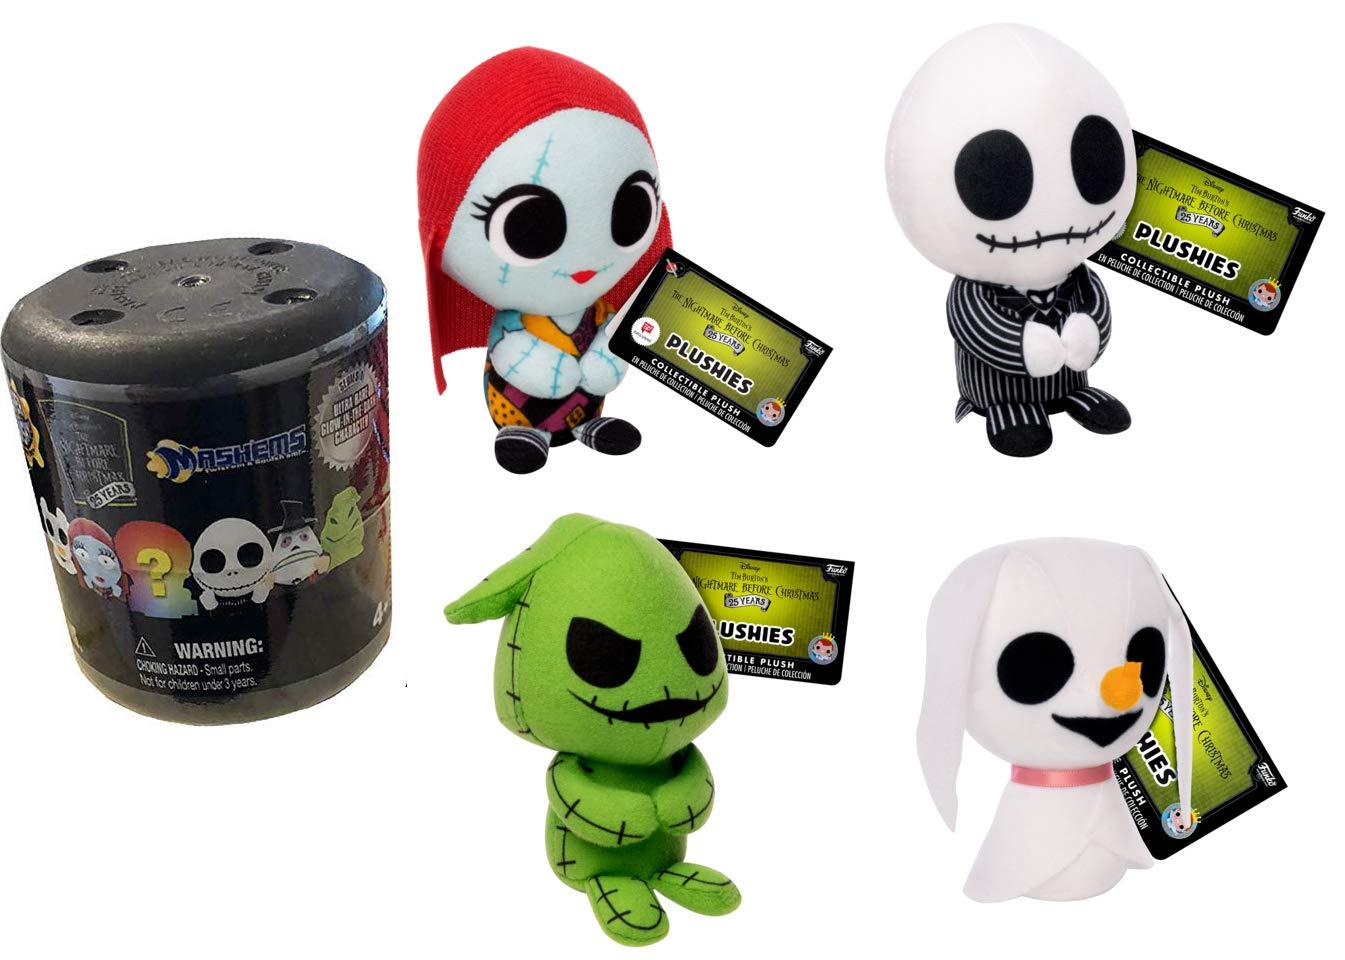 Amazon.com: Spooky and Lovable 4 Nightmare Before Christmas Jack & Sally Plush Doll & Zero Ghost Dog + Oogie Boogie Mini Halloweentown Stuffed Character ...